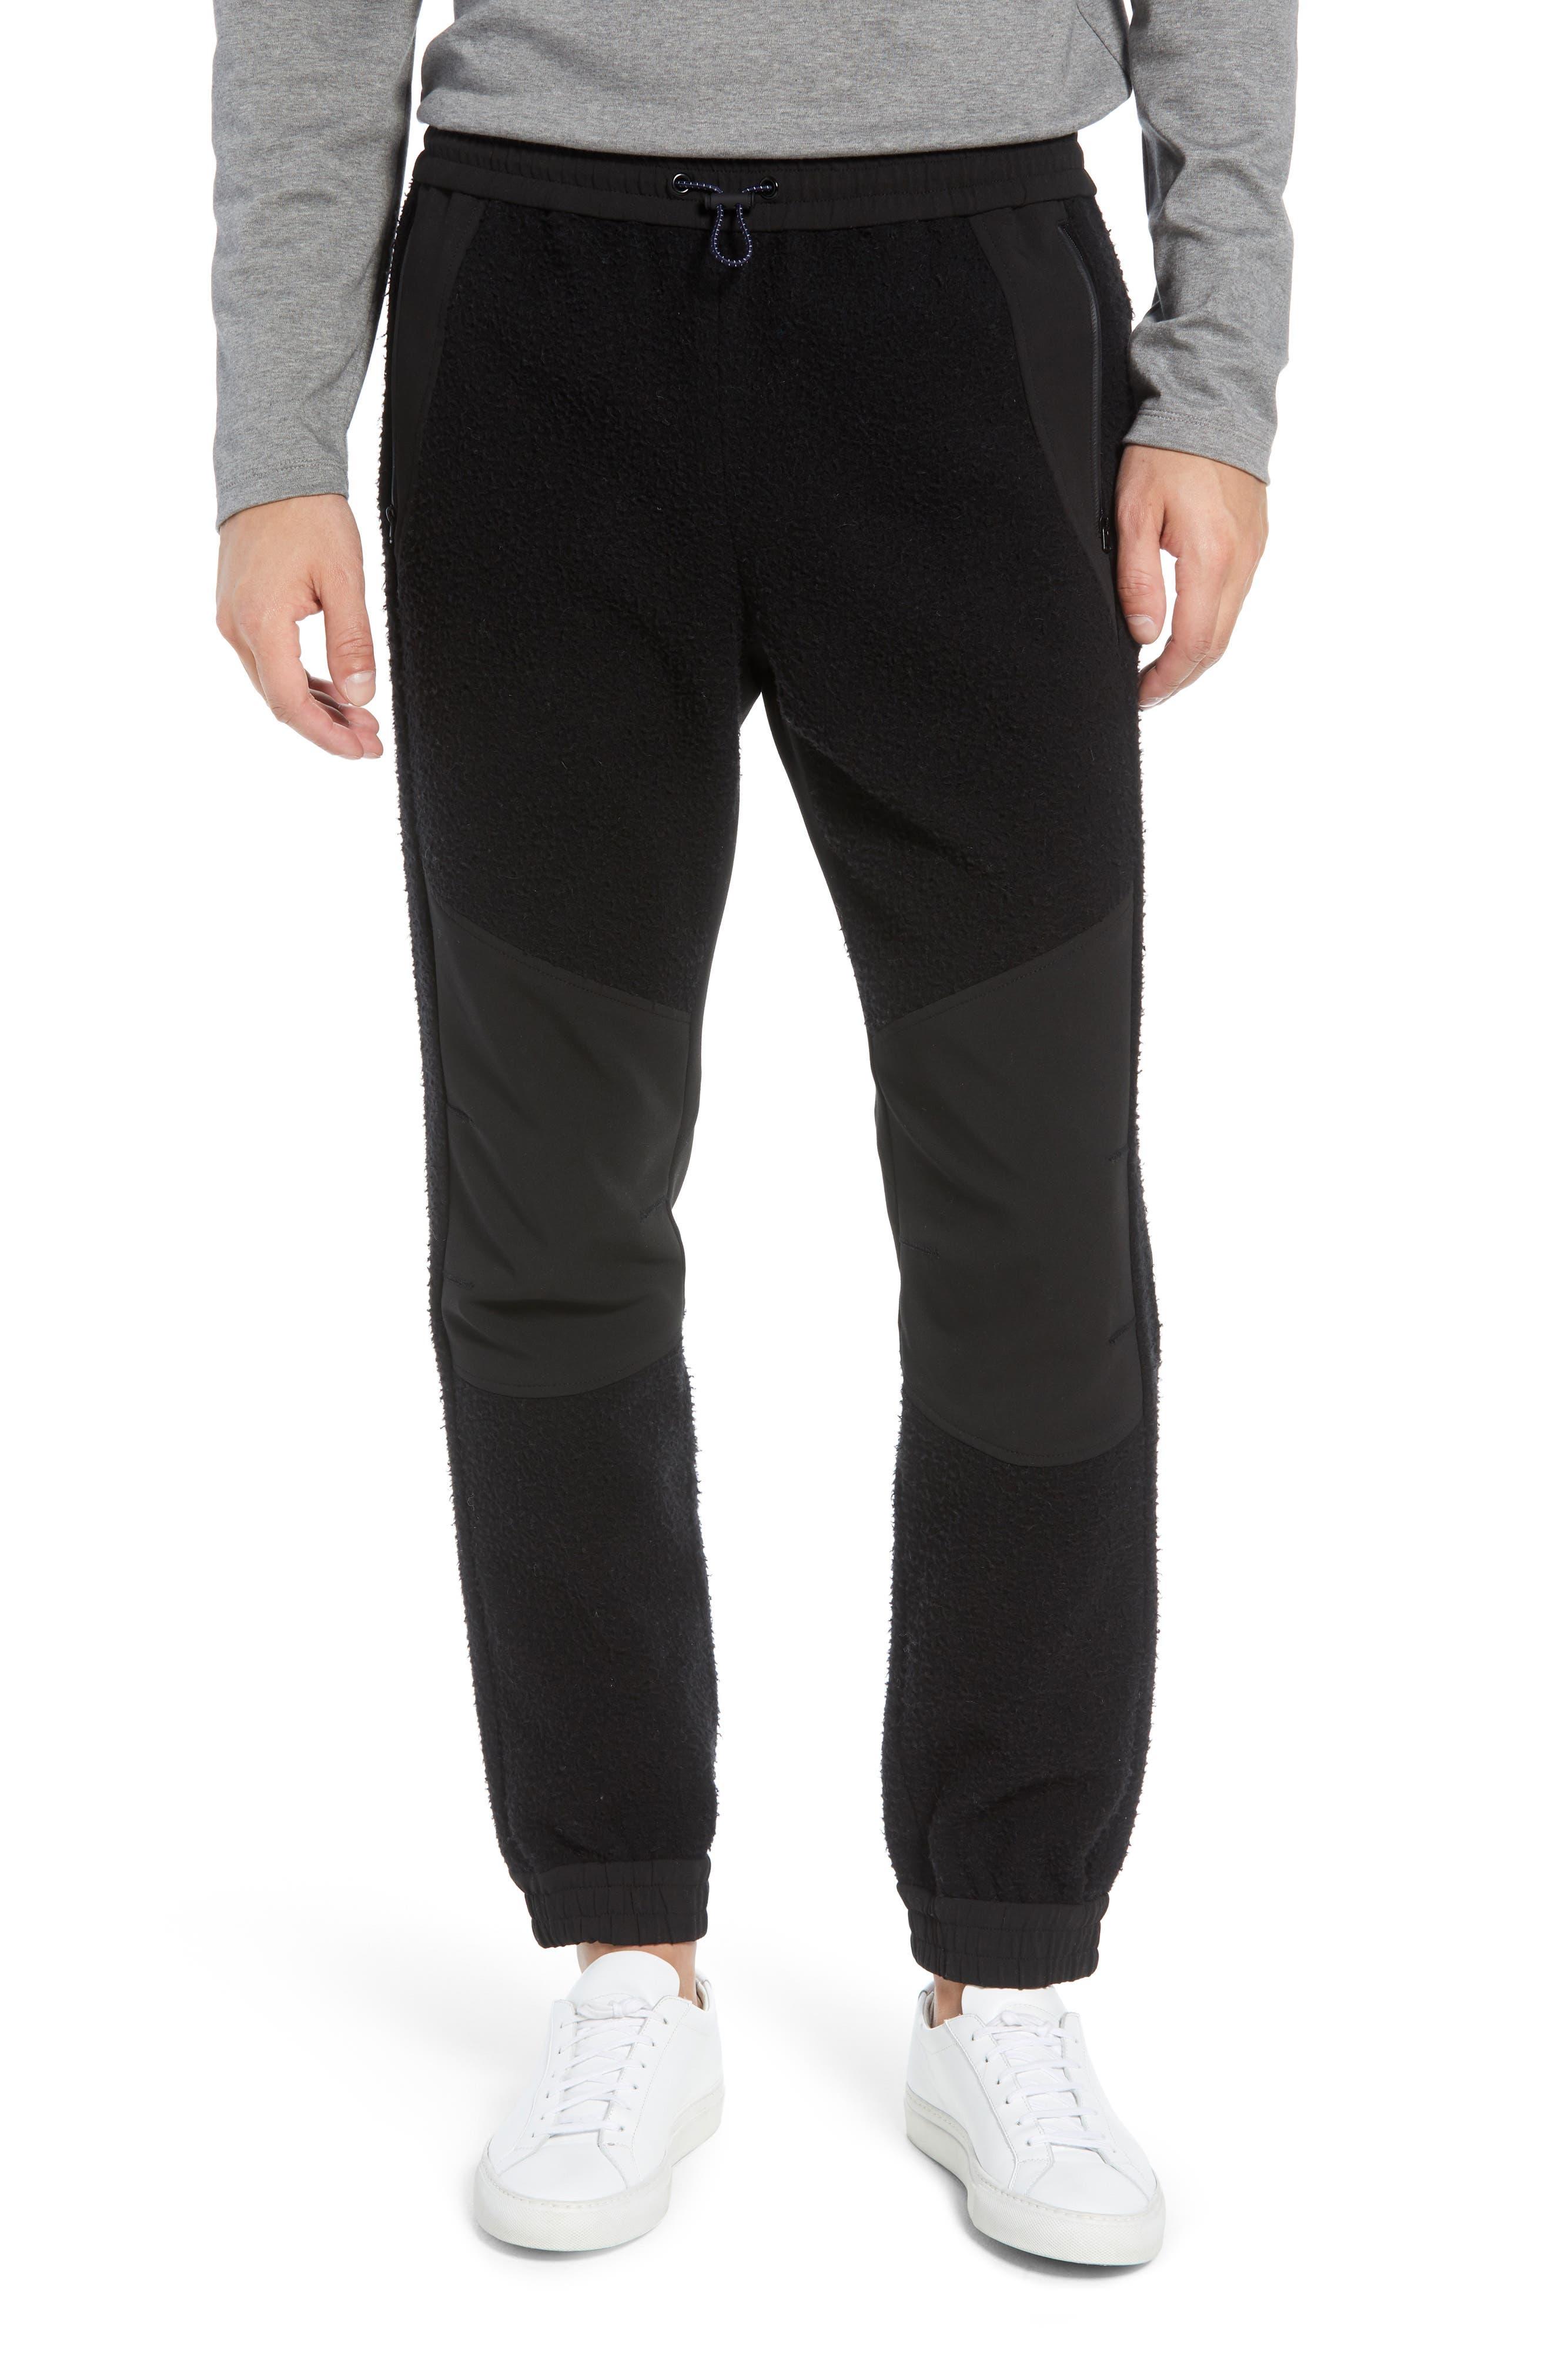 Tech Jogger Pants,                             Main thumbnail 1, color,                             BLACK